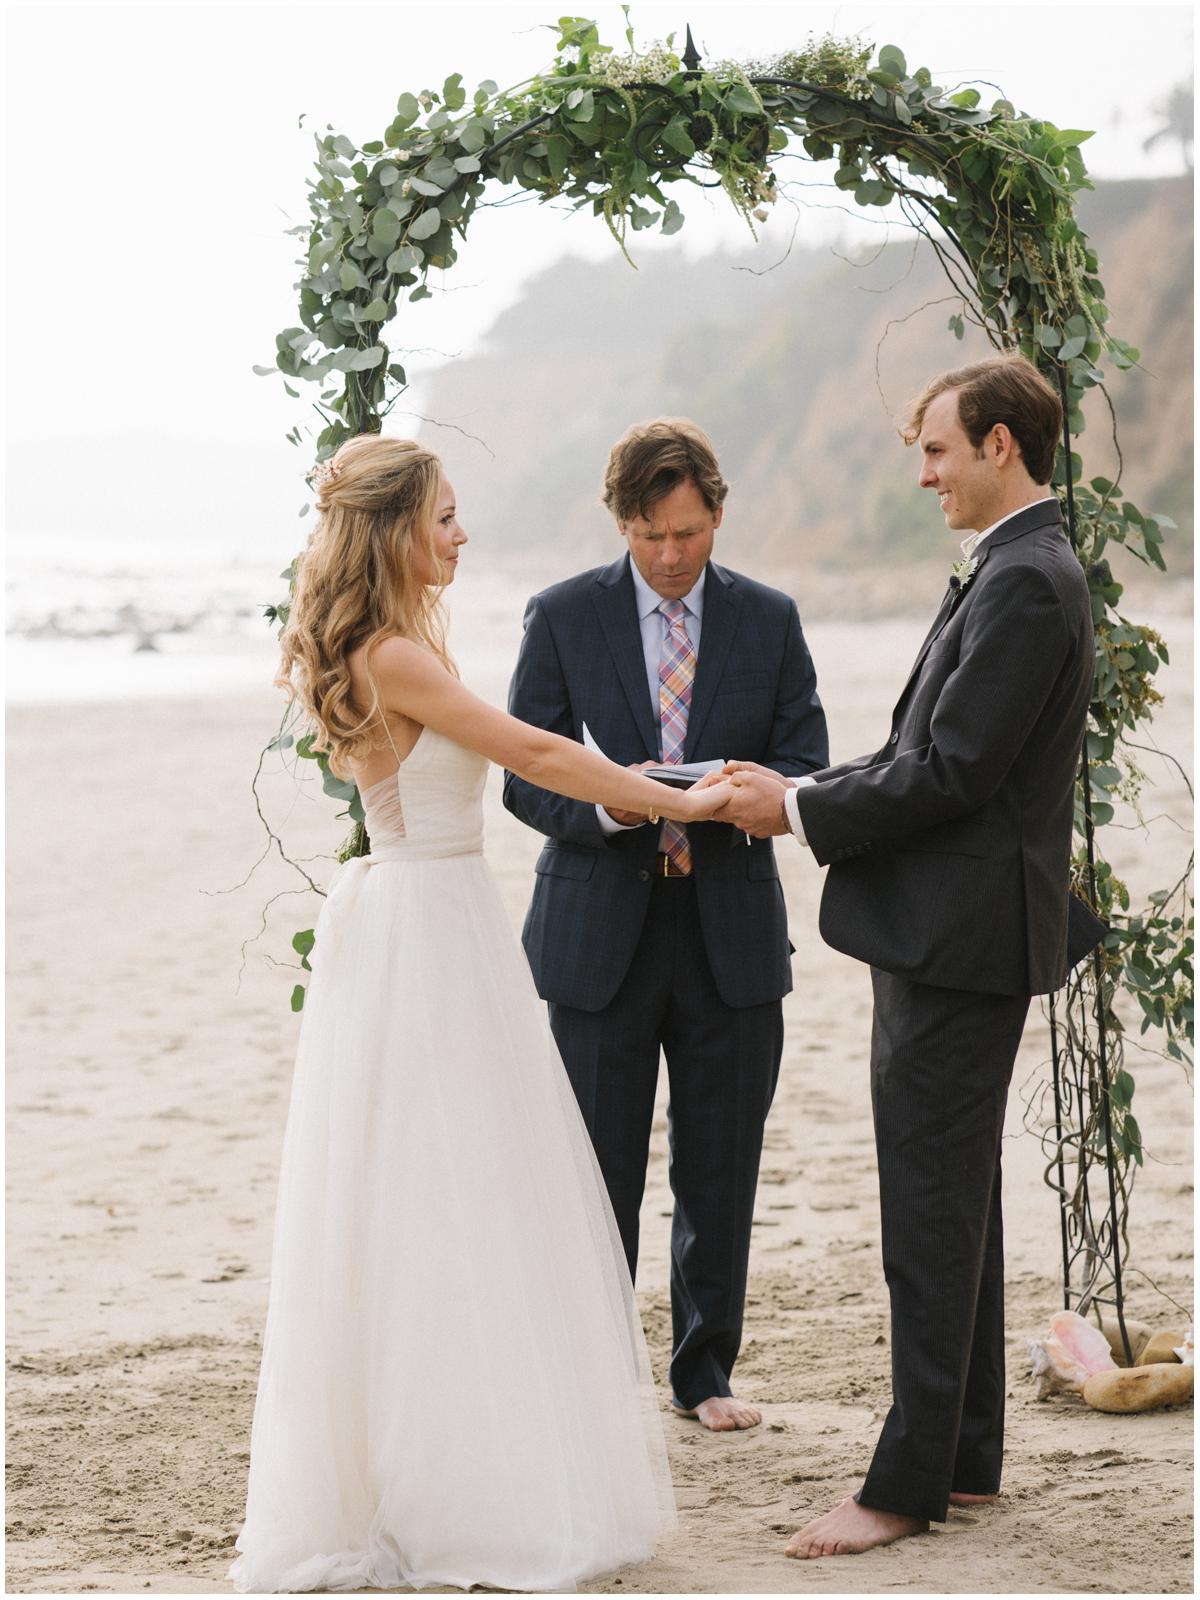 Santa Babara Elopement Wedding Photographer - Pinnel Photography-01-08.jpg